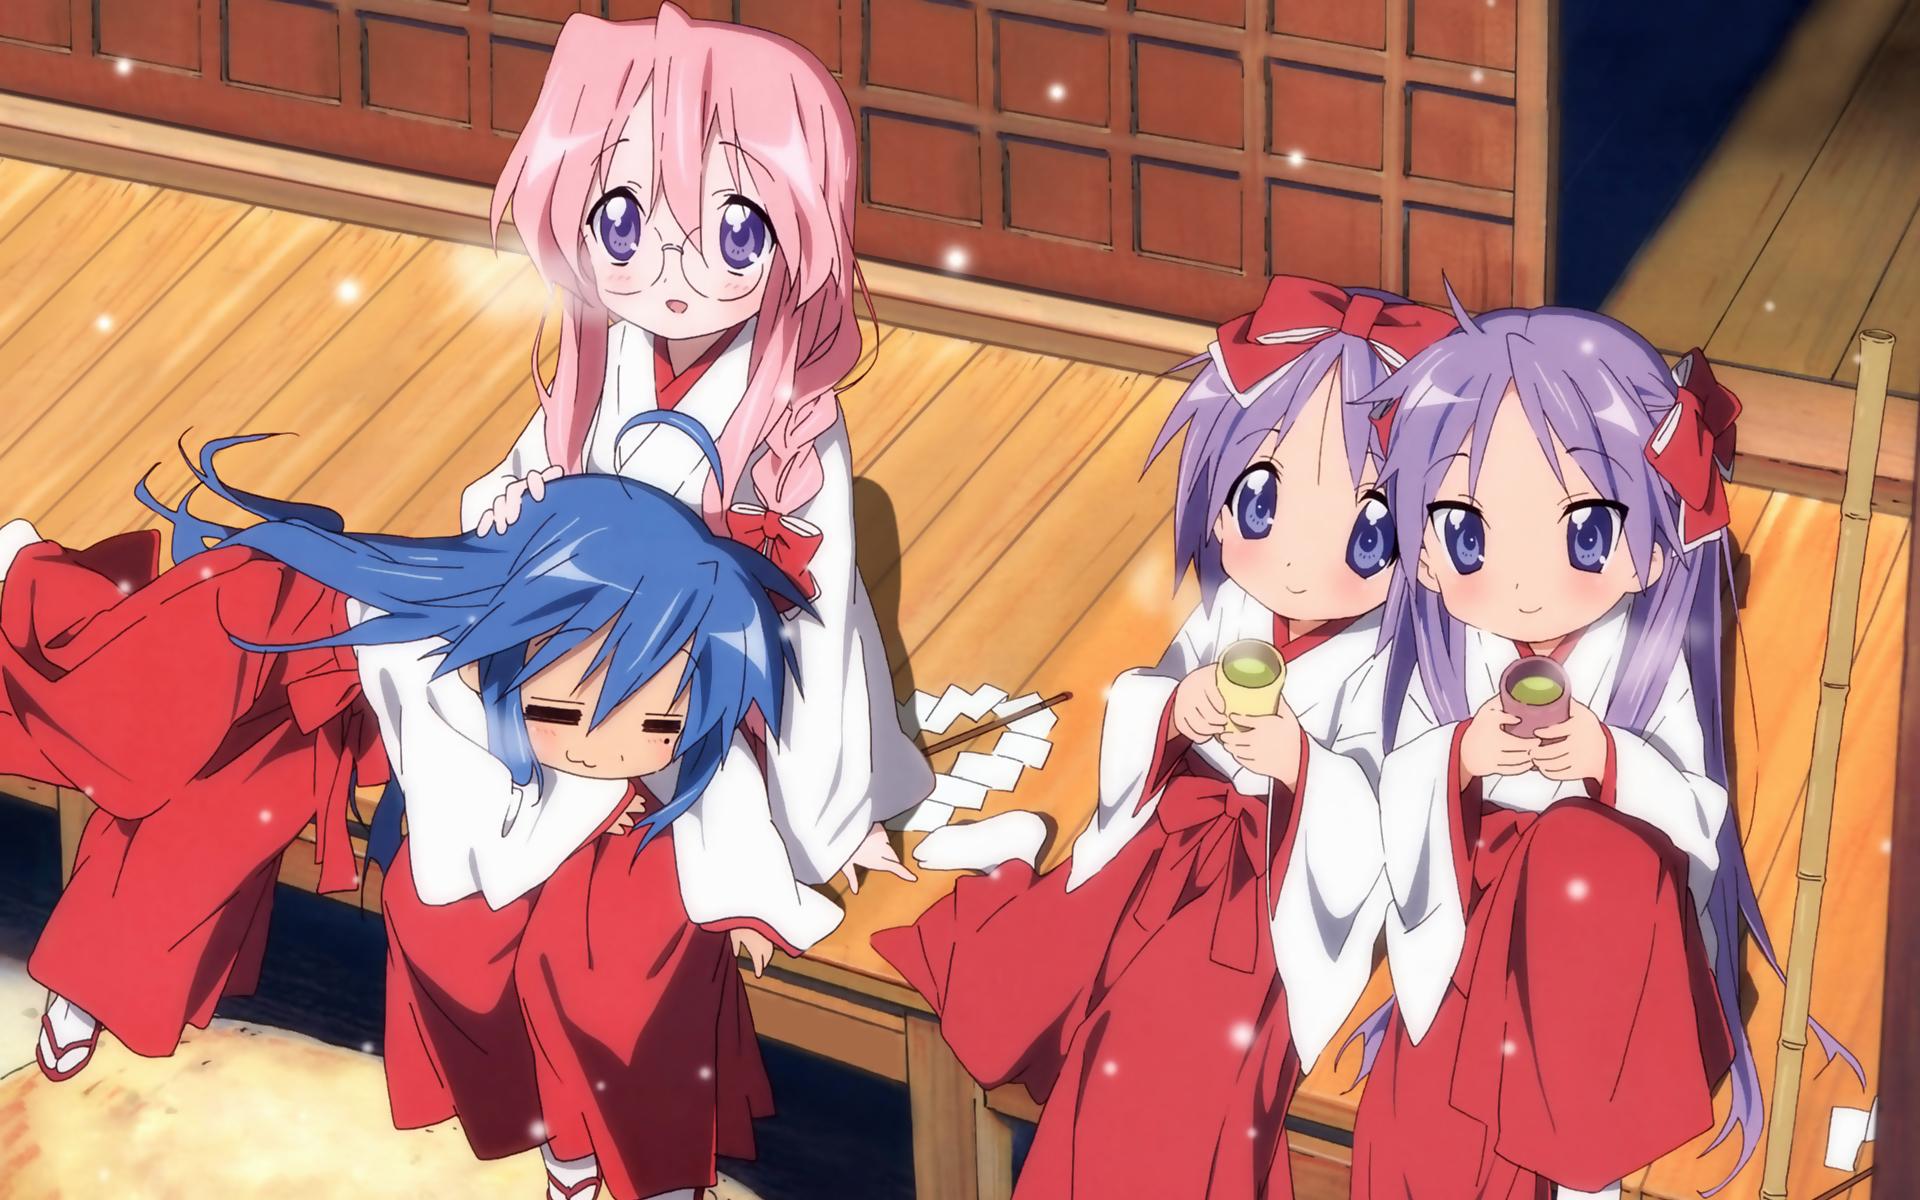 blue_hair hiiragi_kagami hiiragi_tsukasa izumi_konata japanese_clothes lucky_star miko pink_hair purple_eyes purple_hair ribbons takara_miyuki